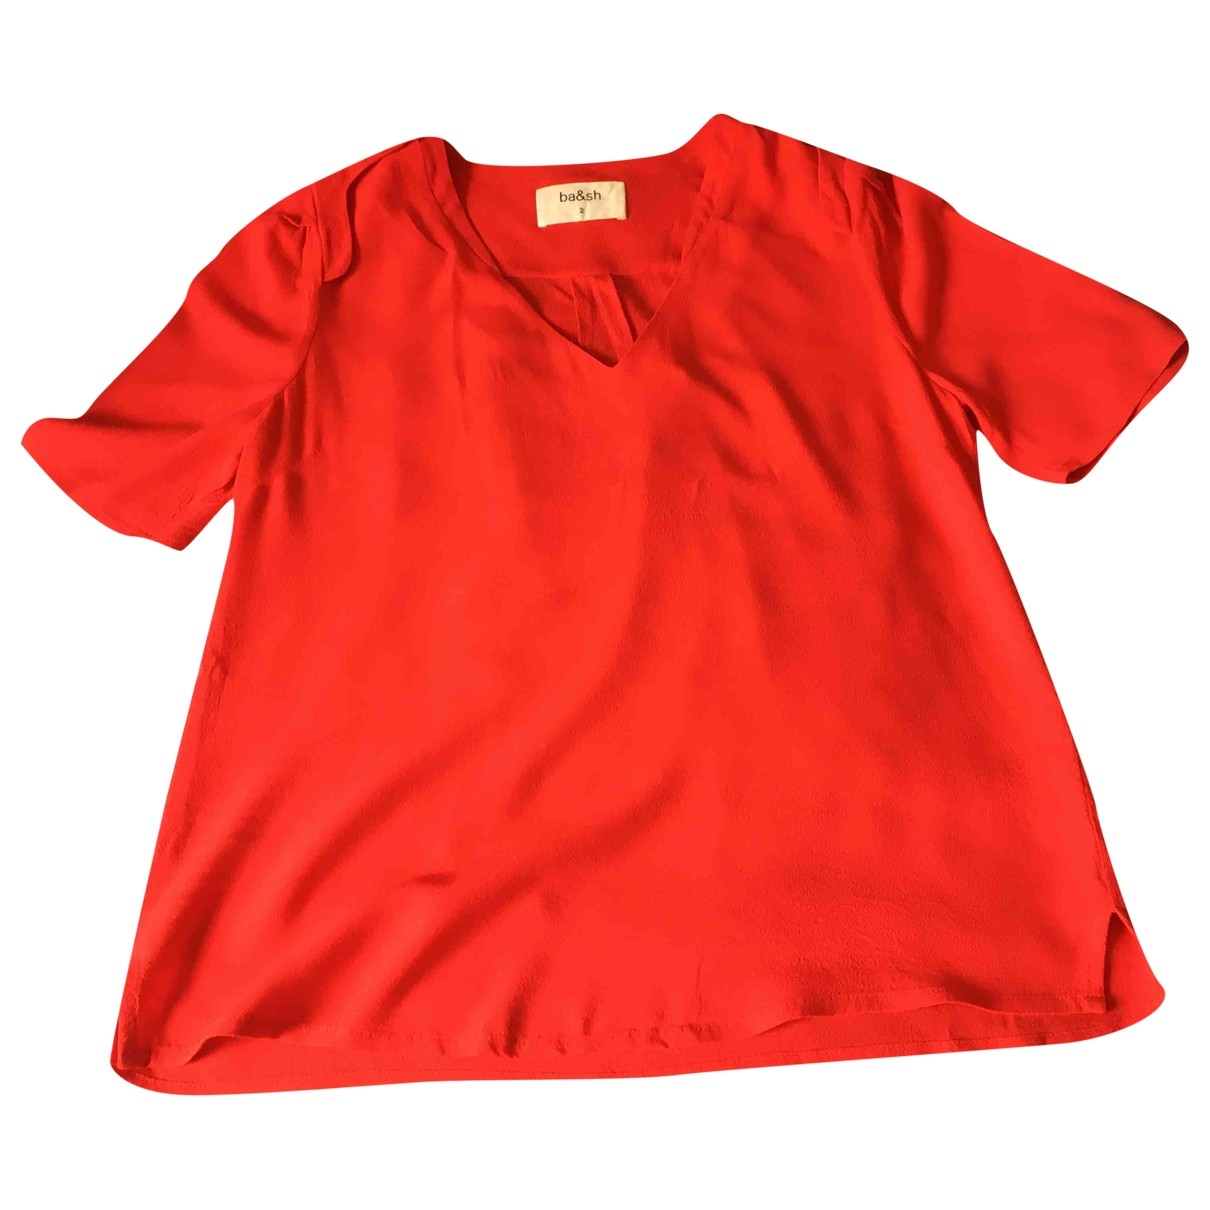 Ba&sh \N Red  top for Women 40 FR